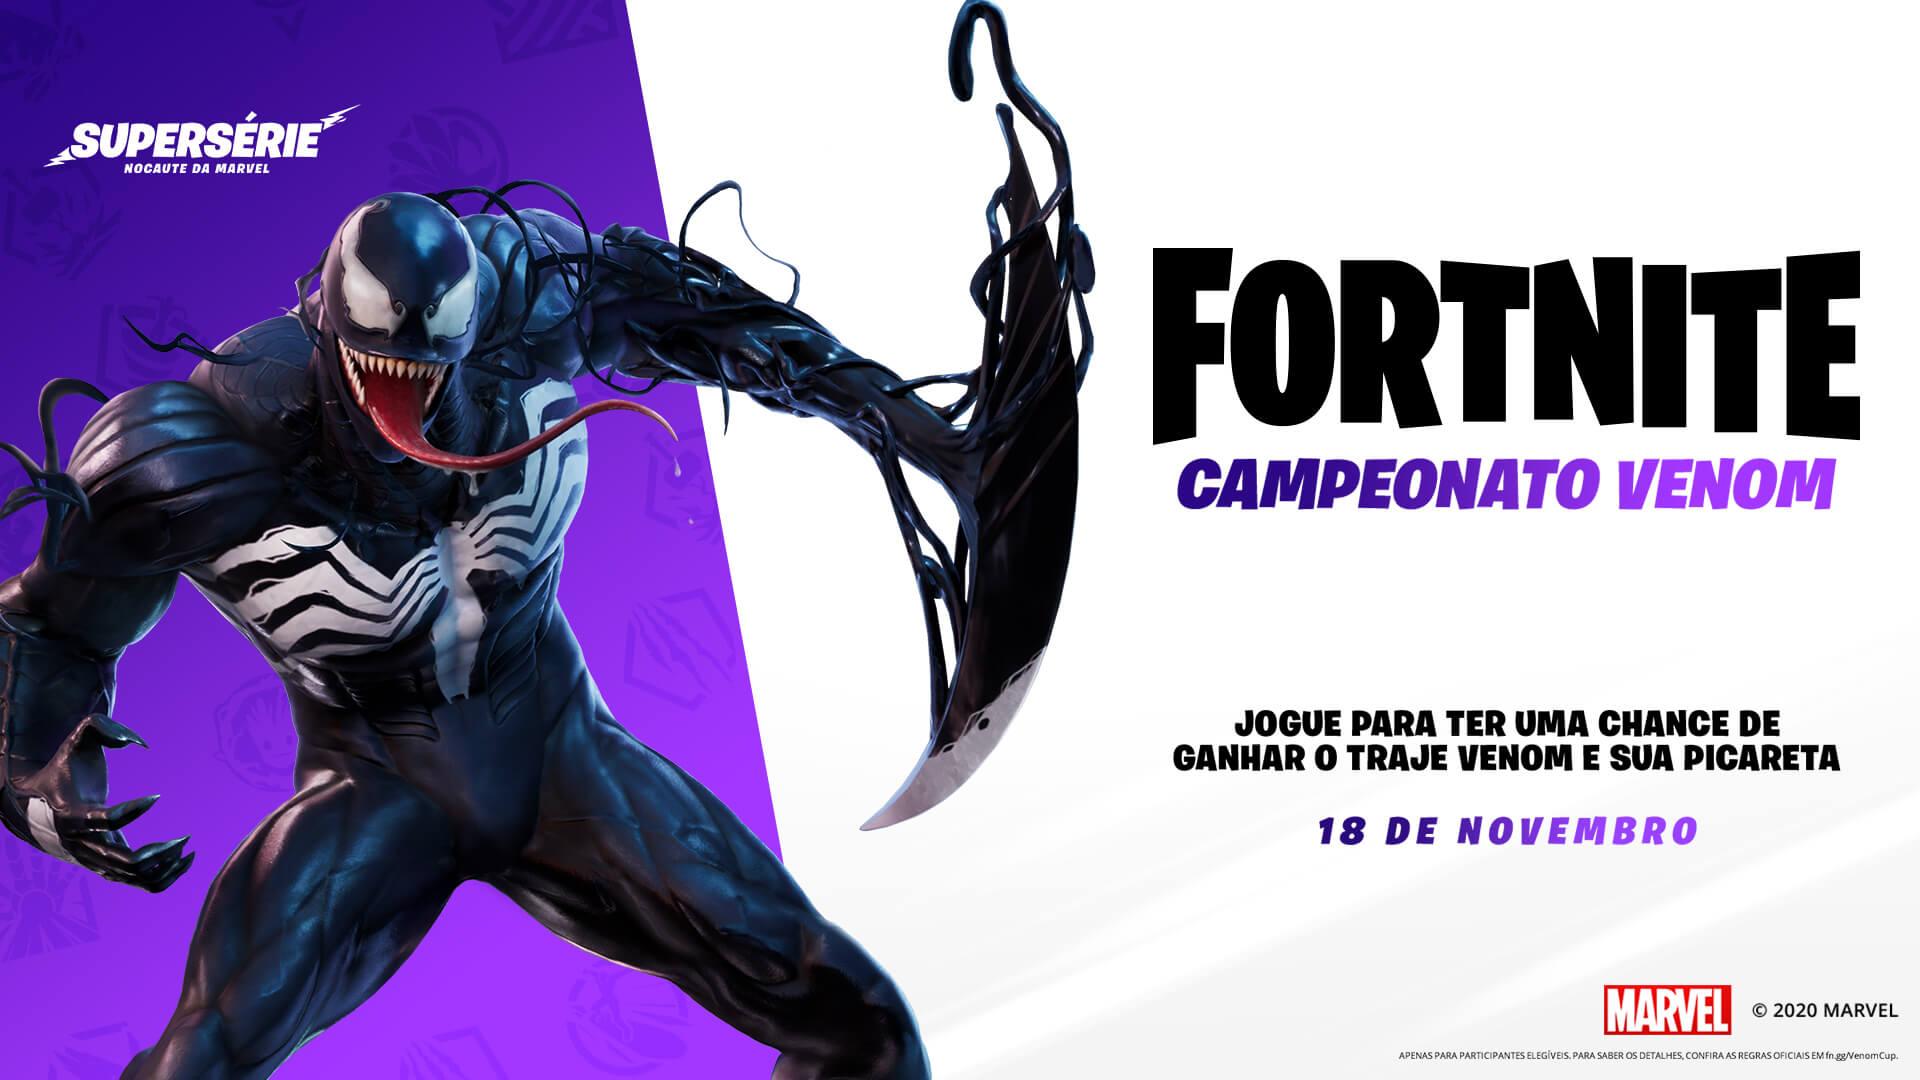 Fortnite Venom Outfit Pt Br